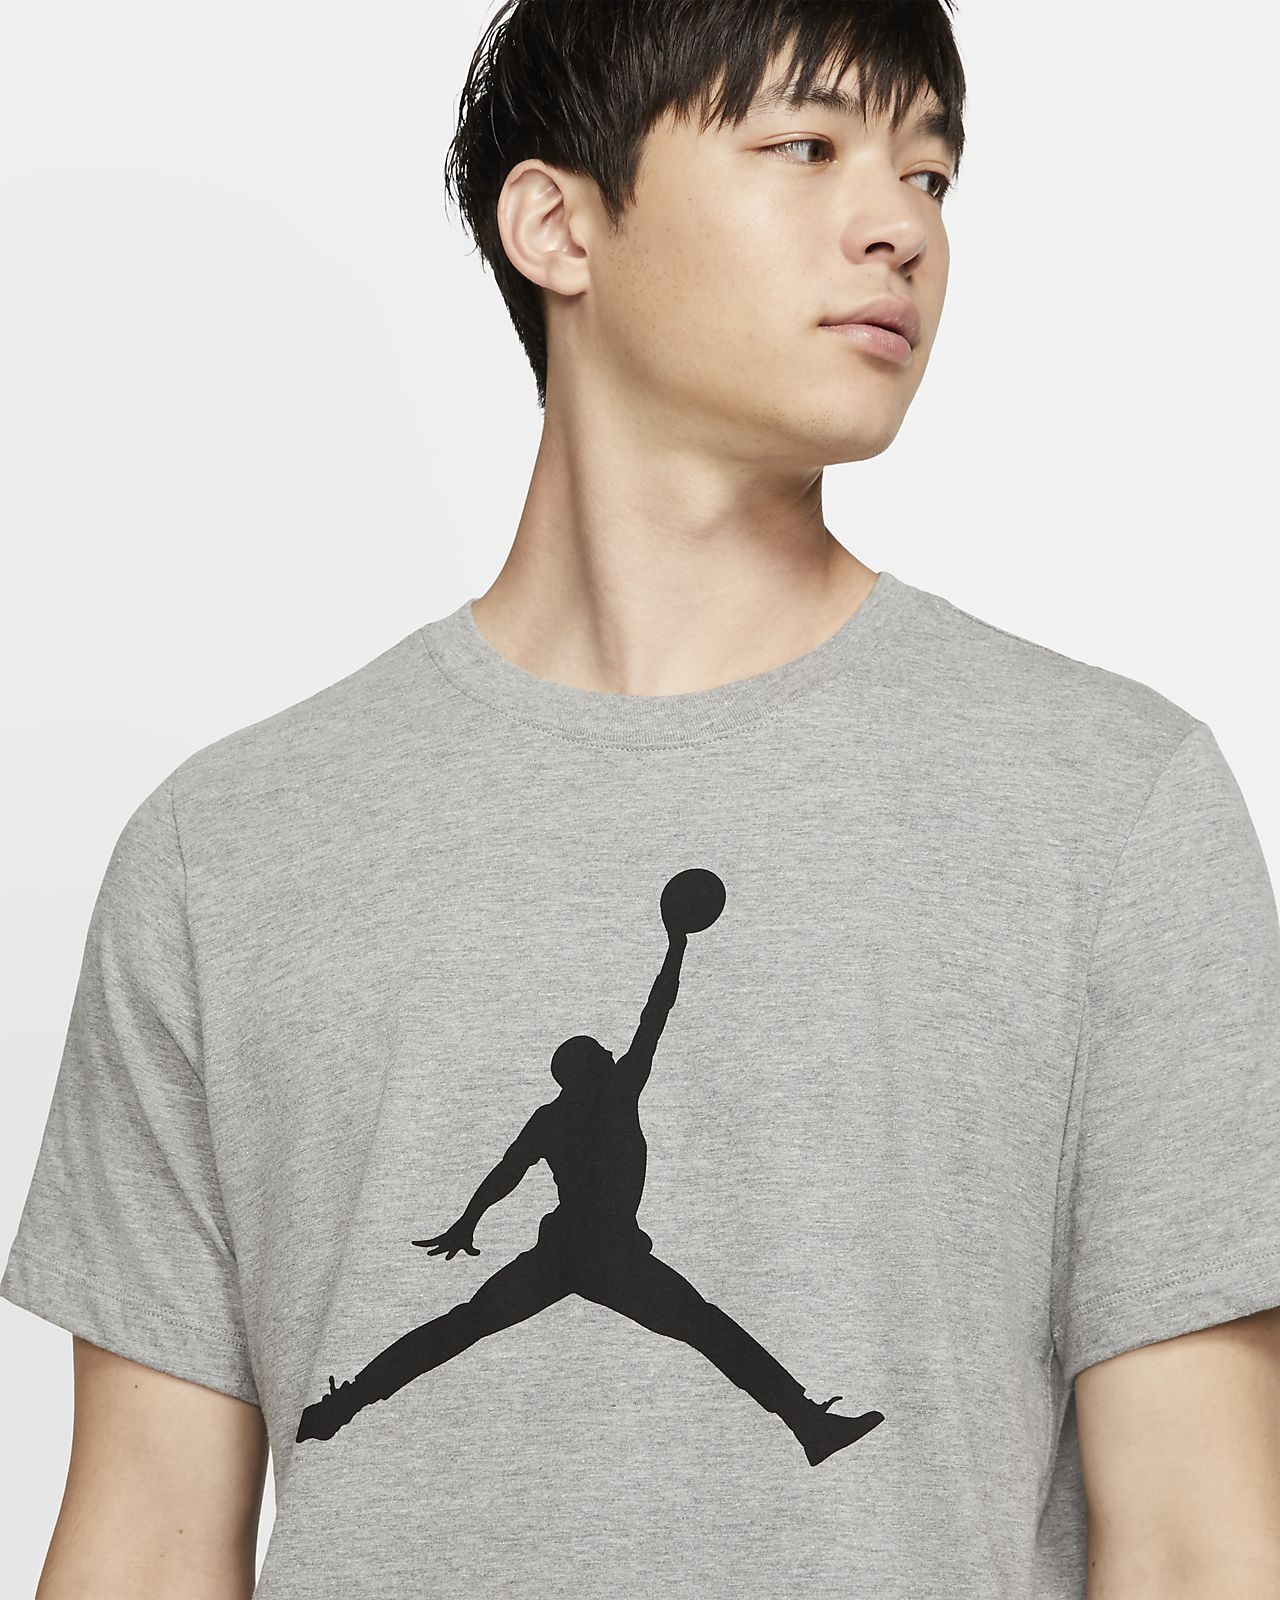 Nike Men Tshirts Air Jordan Iconic Air Jordan Logo Tee Black Heather